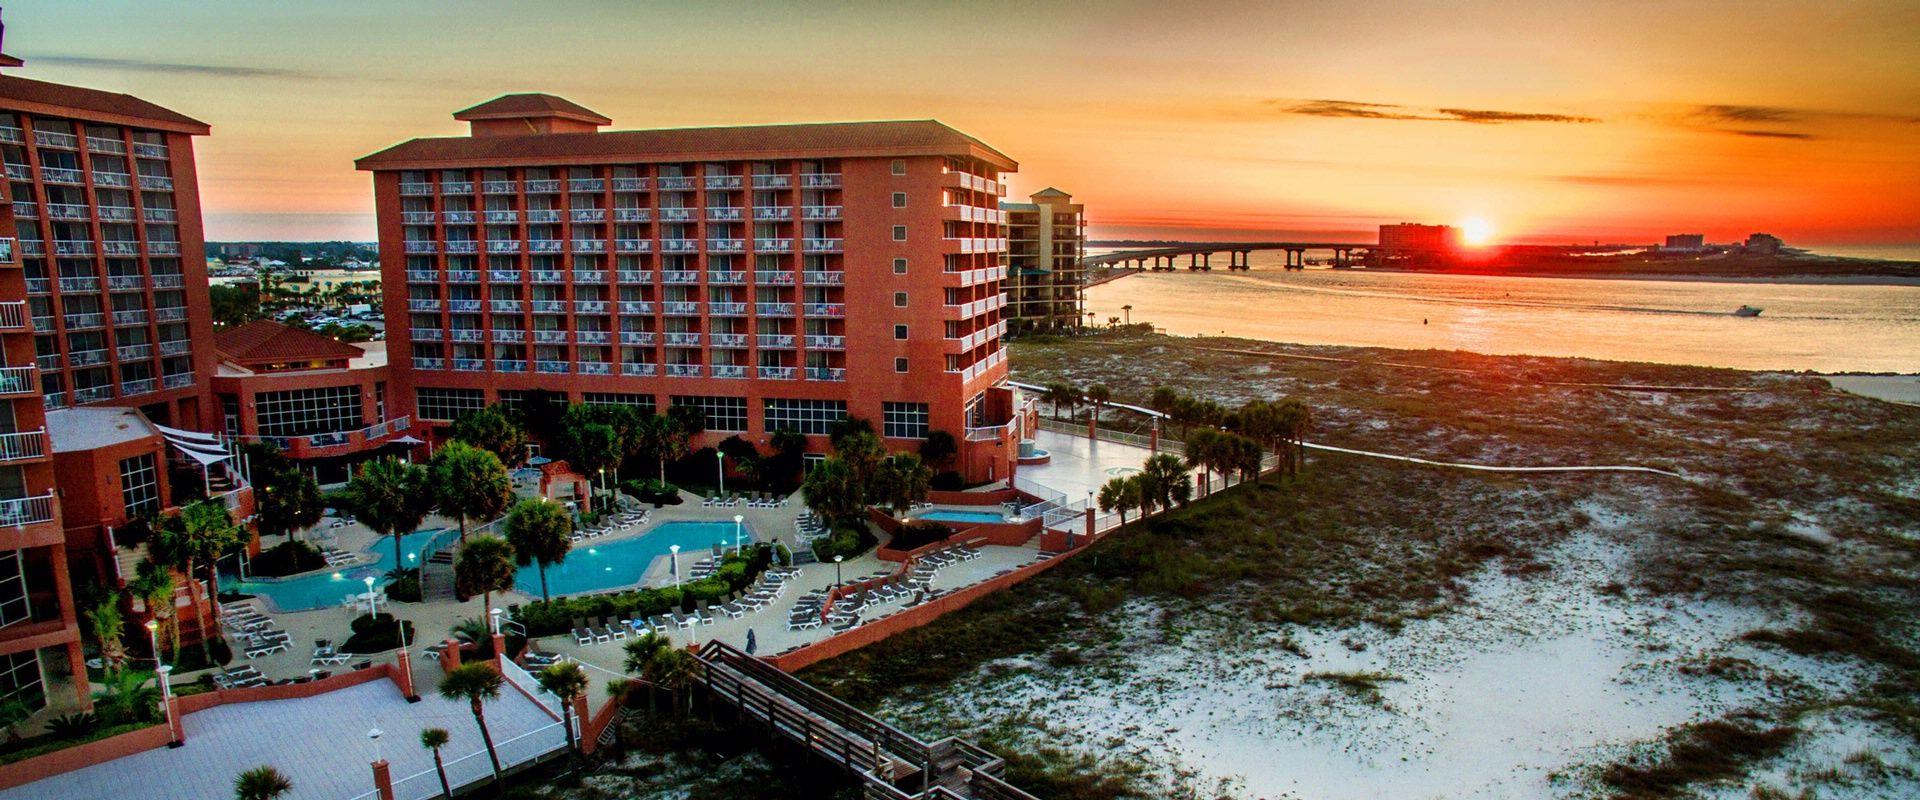 Gulf Shores Hotel Deals Perdido Beach Resort Perdido Beach Resort Orange Beach Hotels Beach Resorts